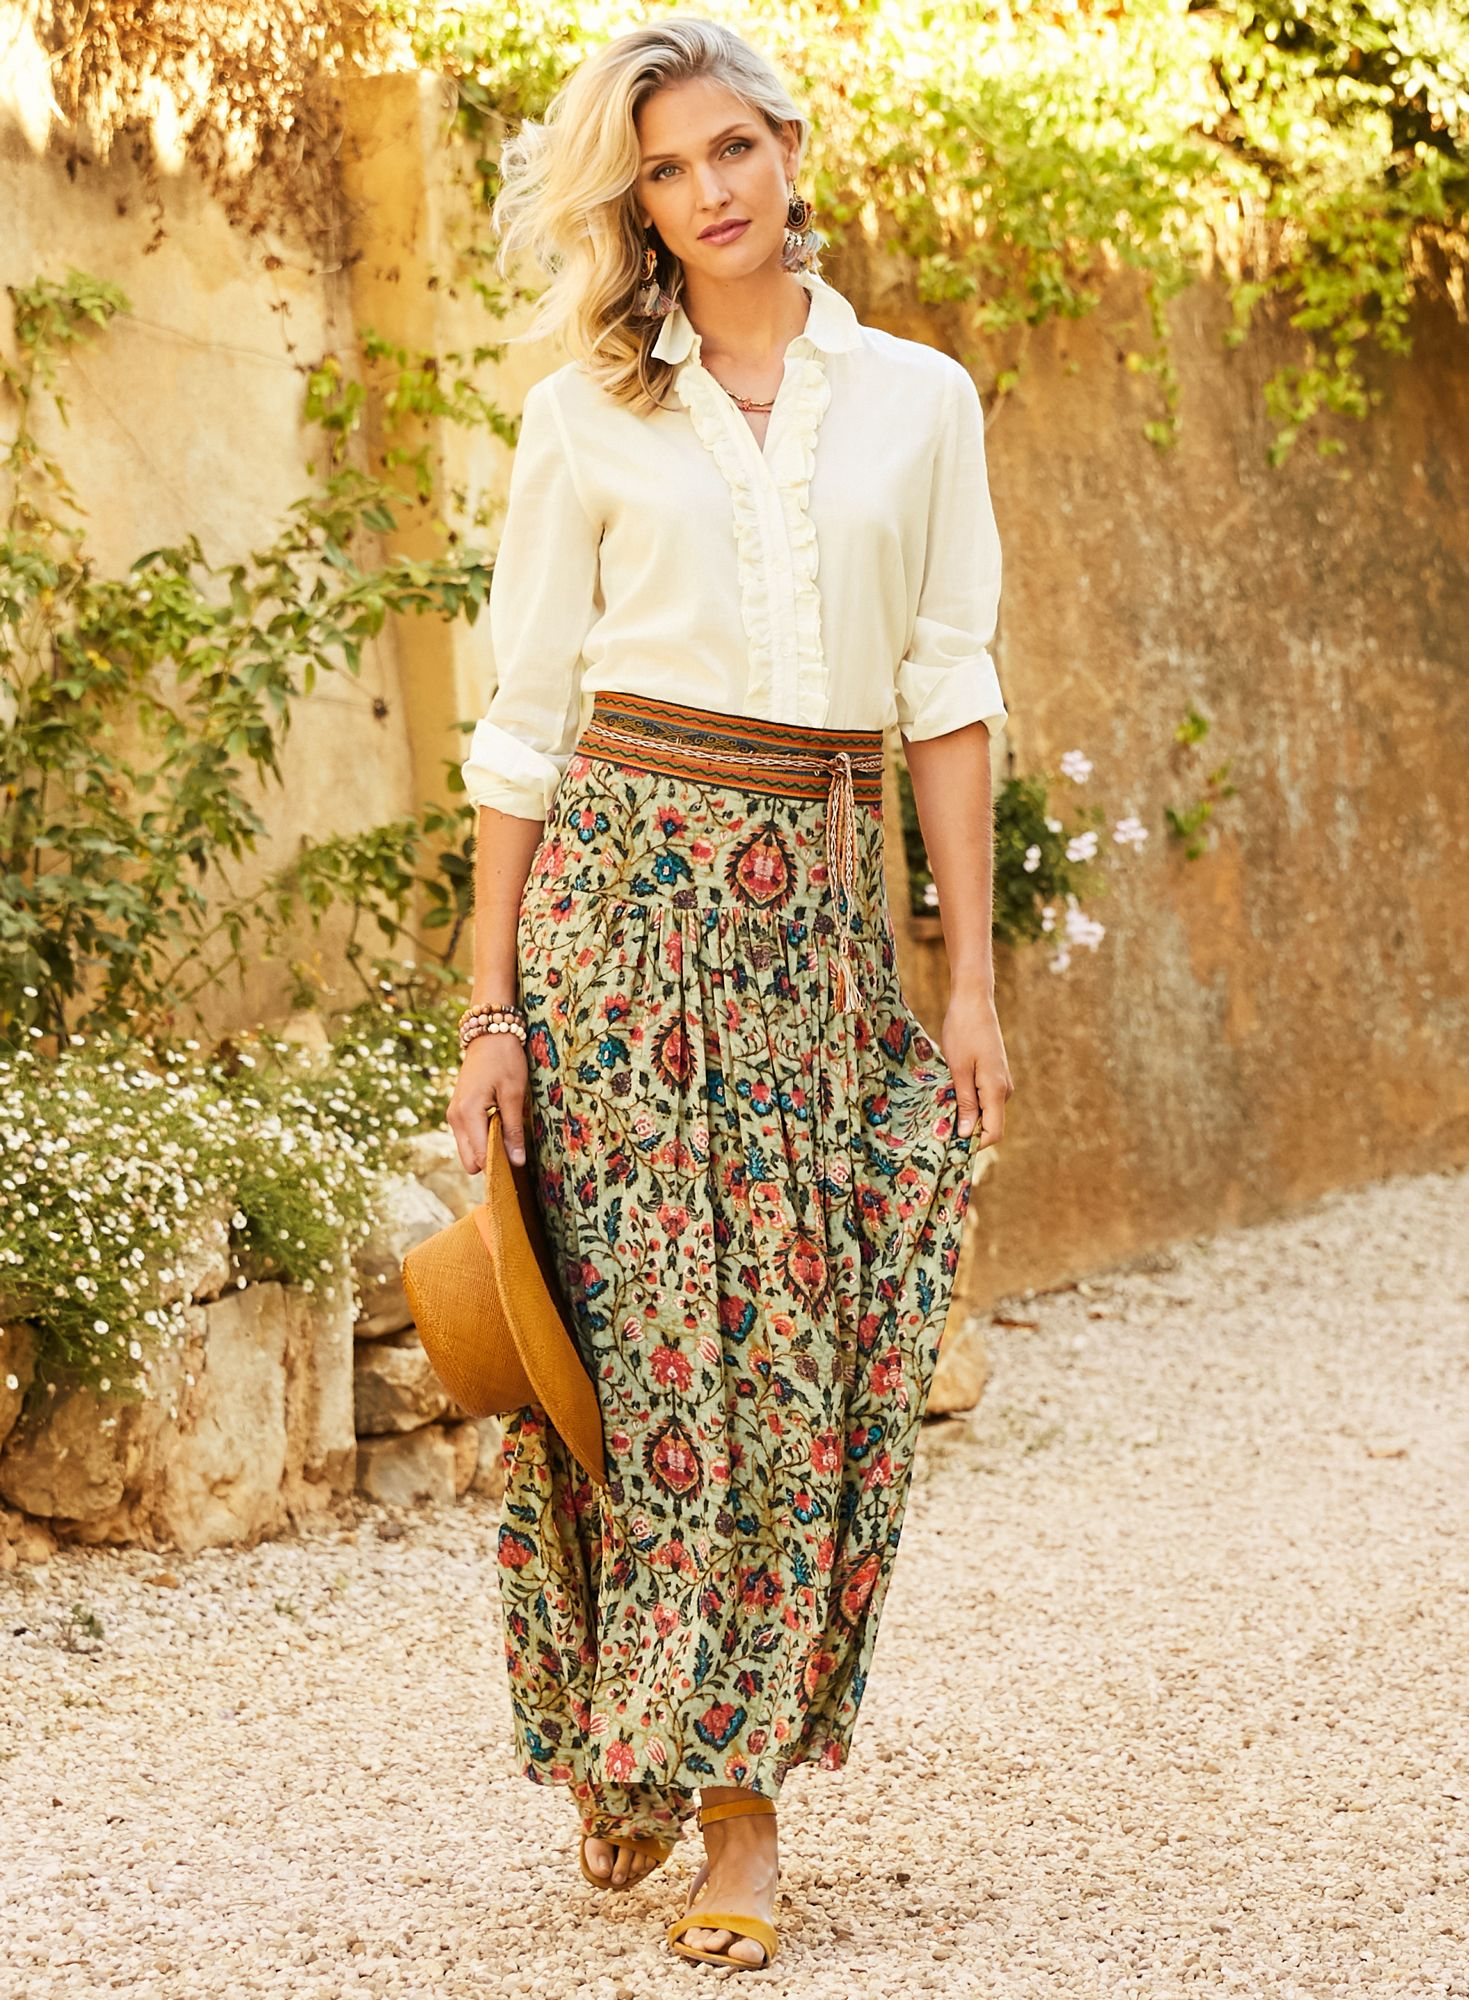 Jaipur Maxi Skirt Fashion For Women Over 40 Fashion Outfits 40 Fashion Women [ 2000 x 1469 Pixel ]